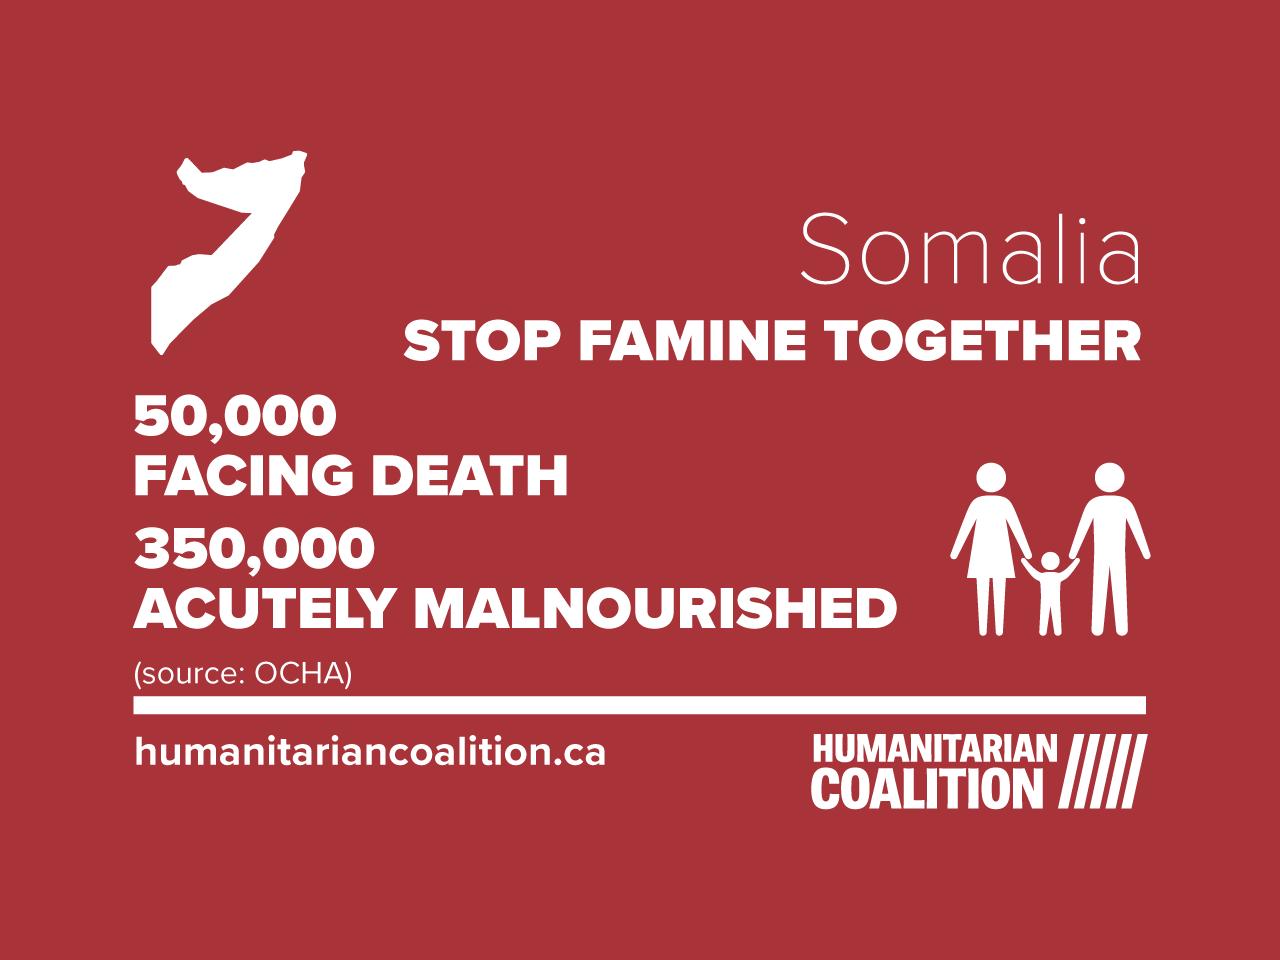 food crisis in Somalia infographic